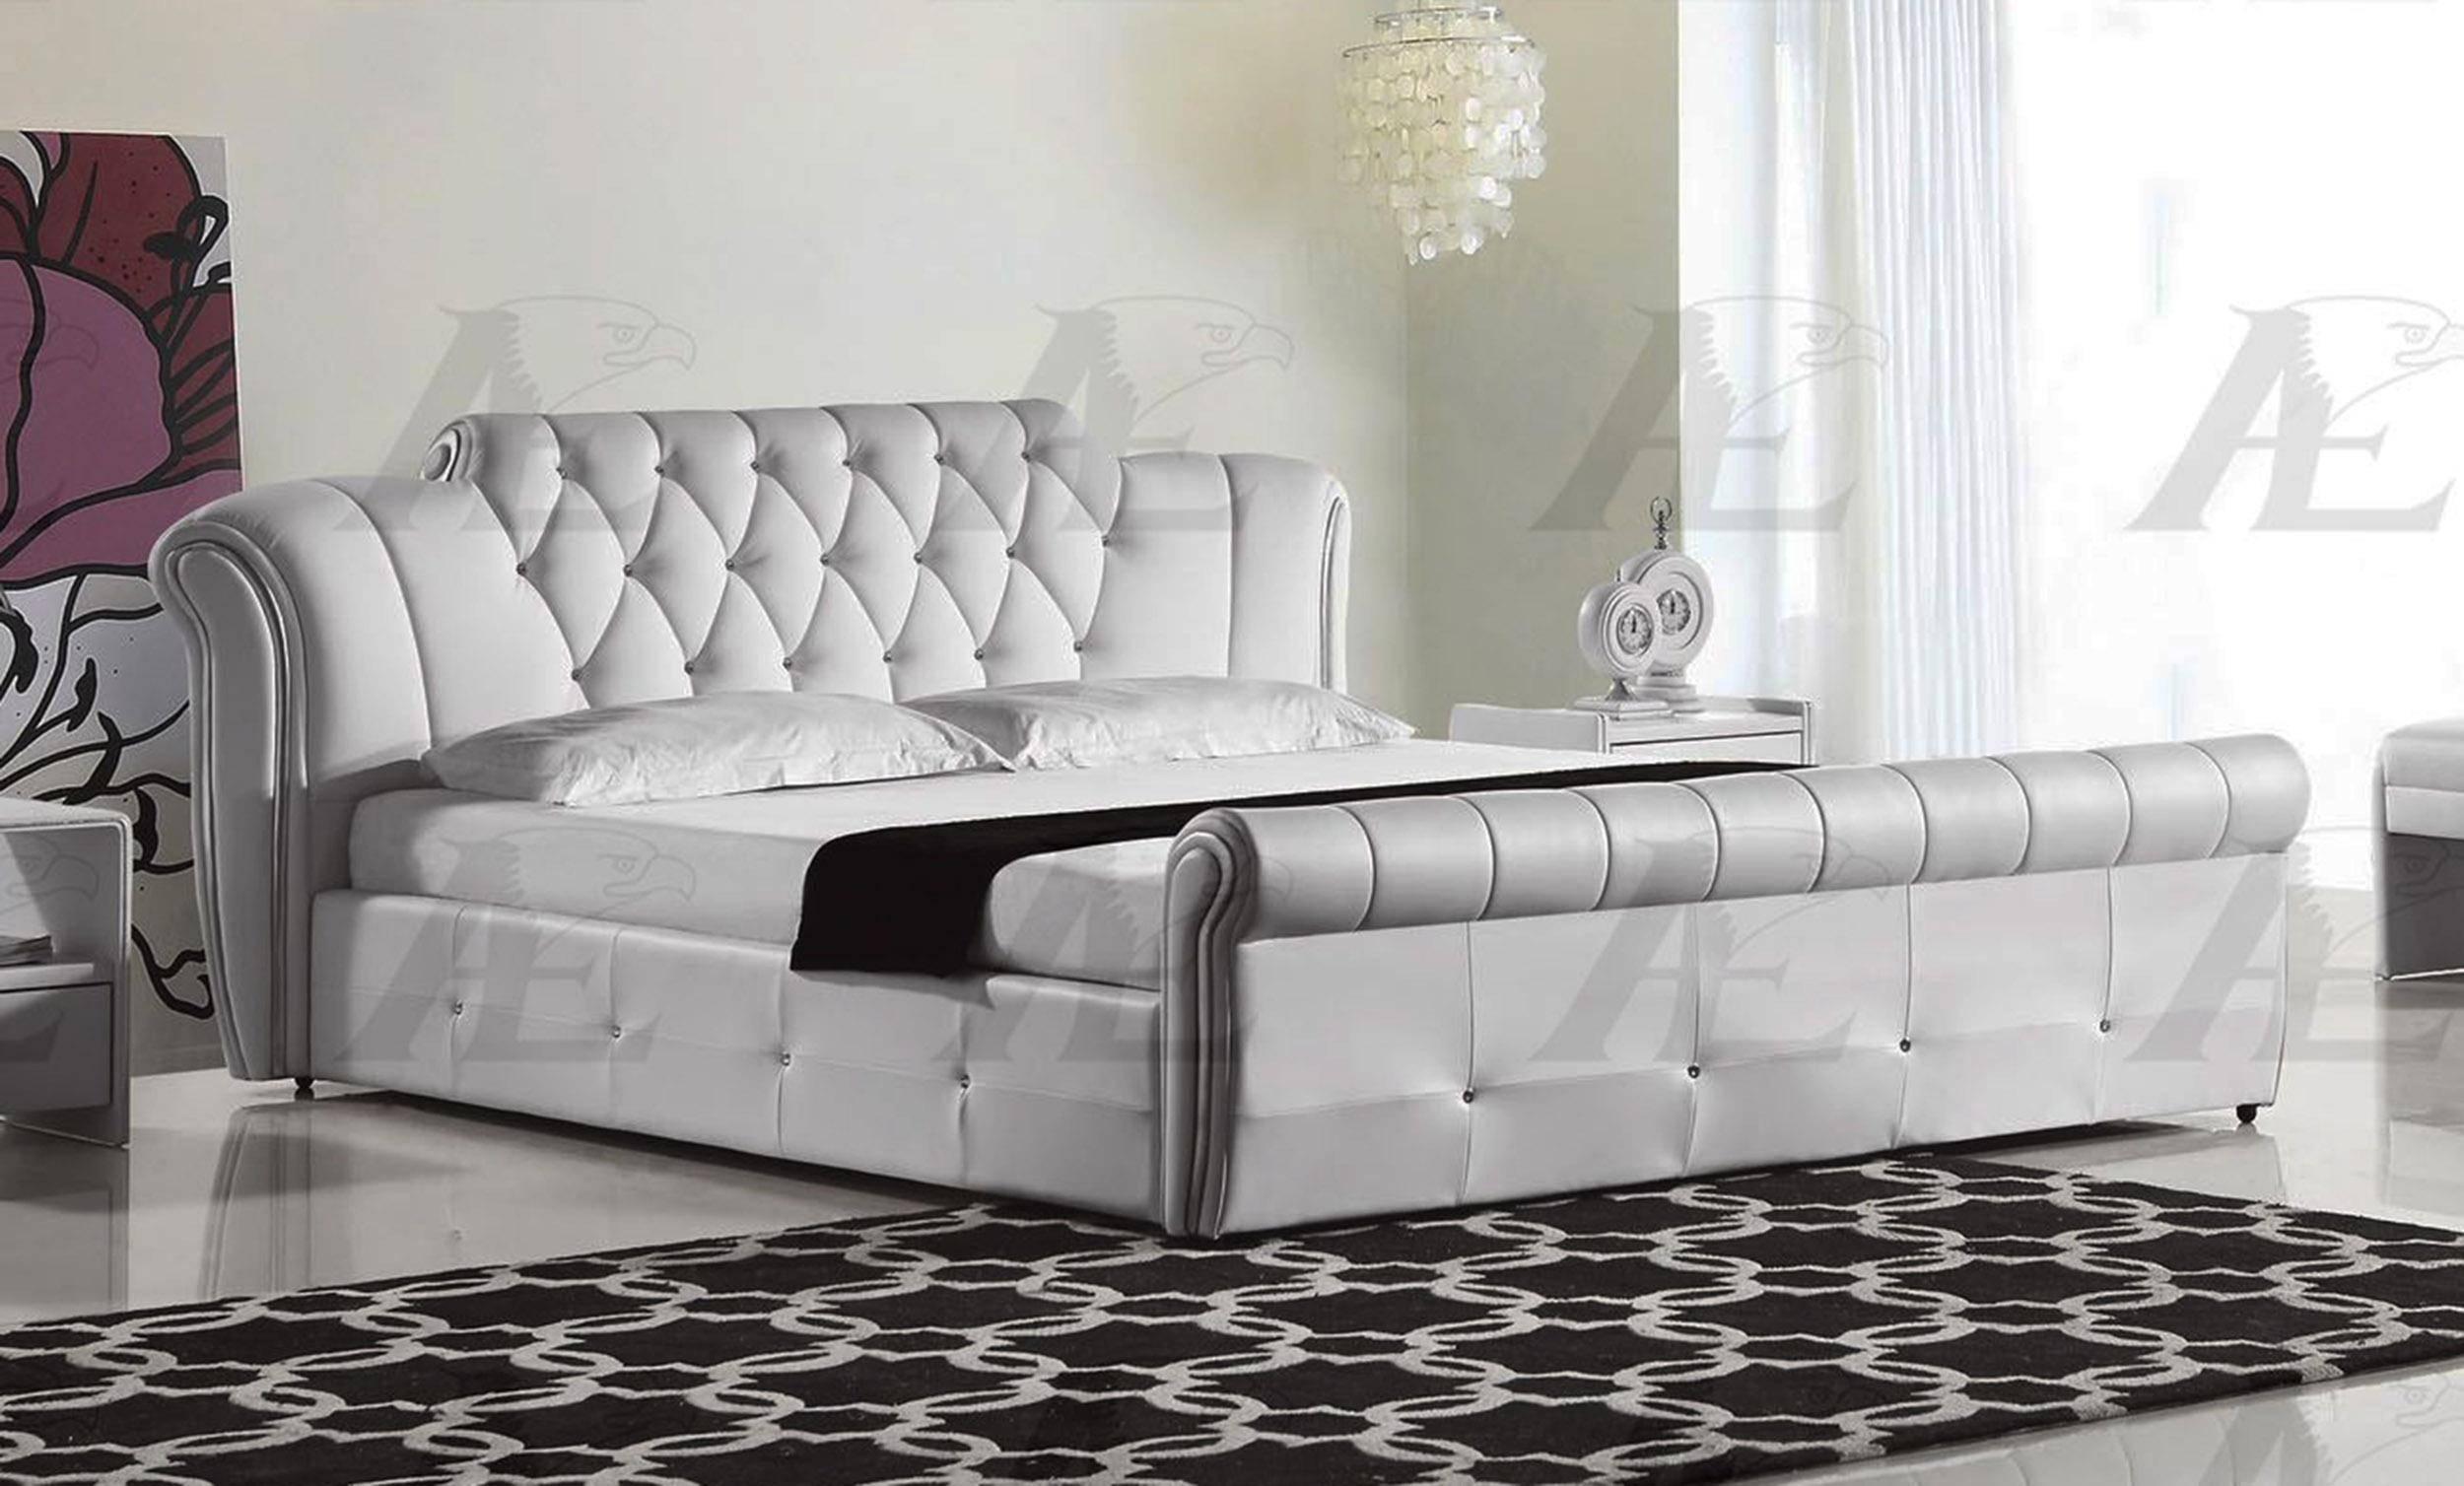 american eagle b d032 w california king platform bed in white pu